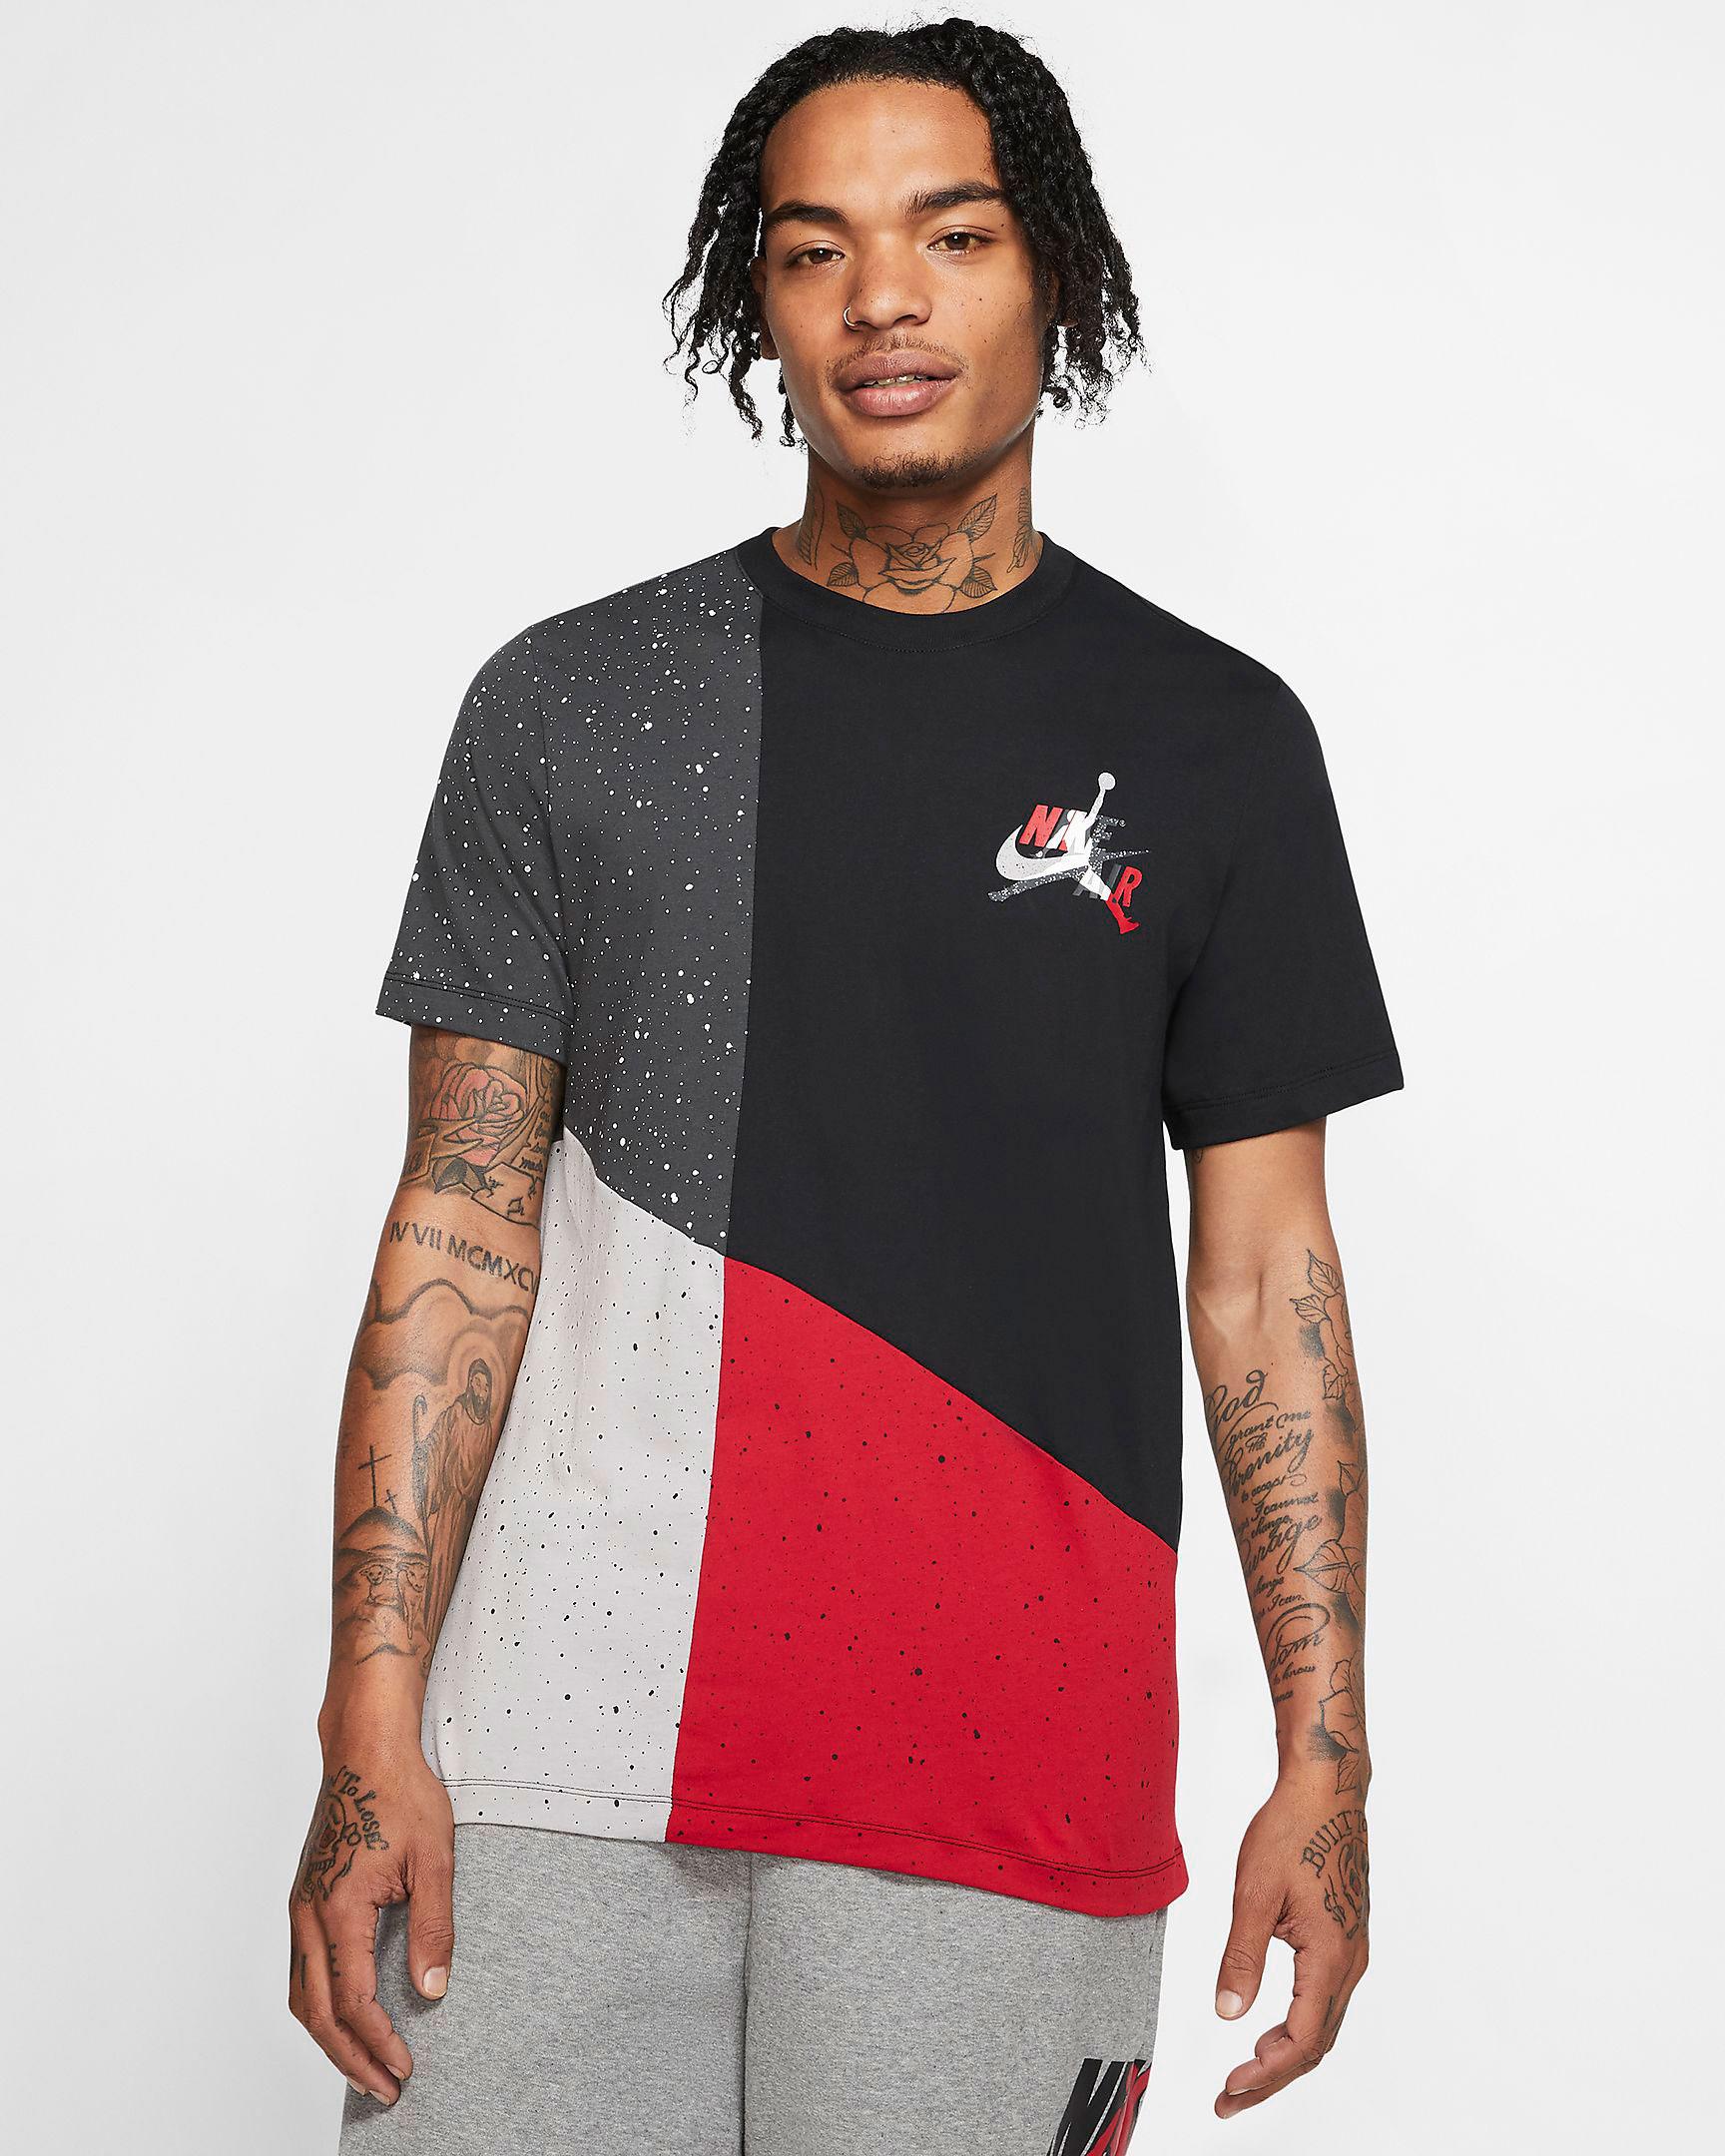 jordan-11-low-ie-black-cement-shirt-match-1